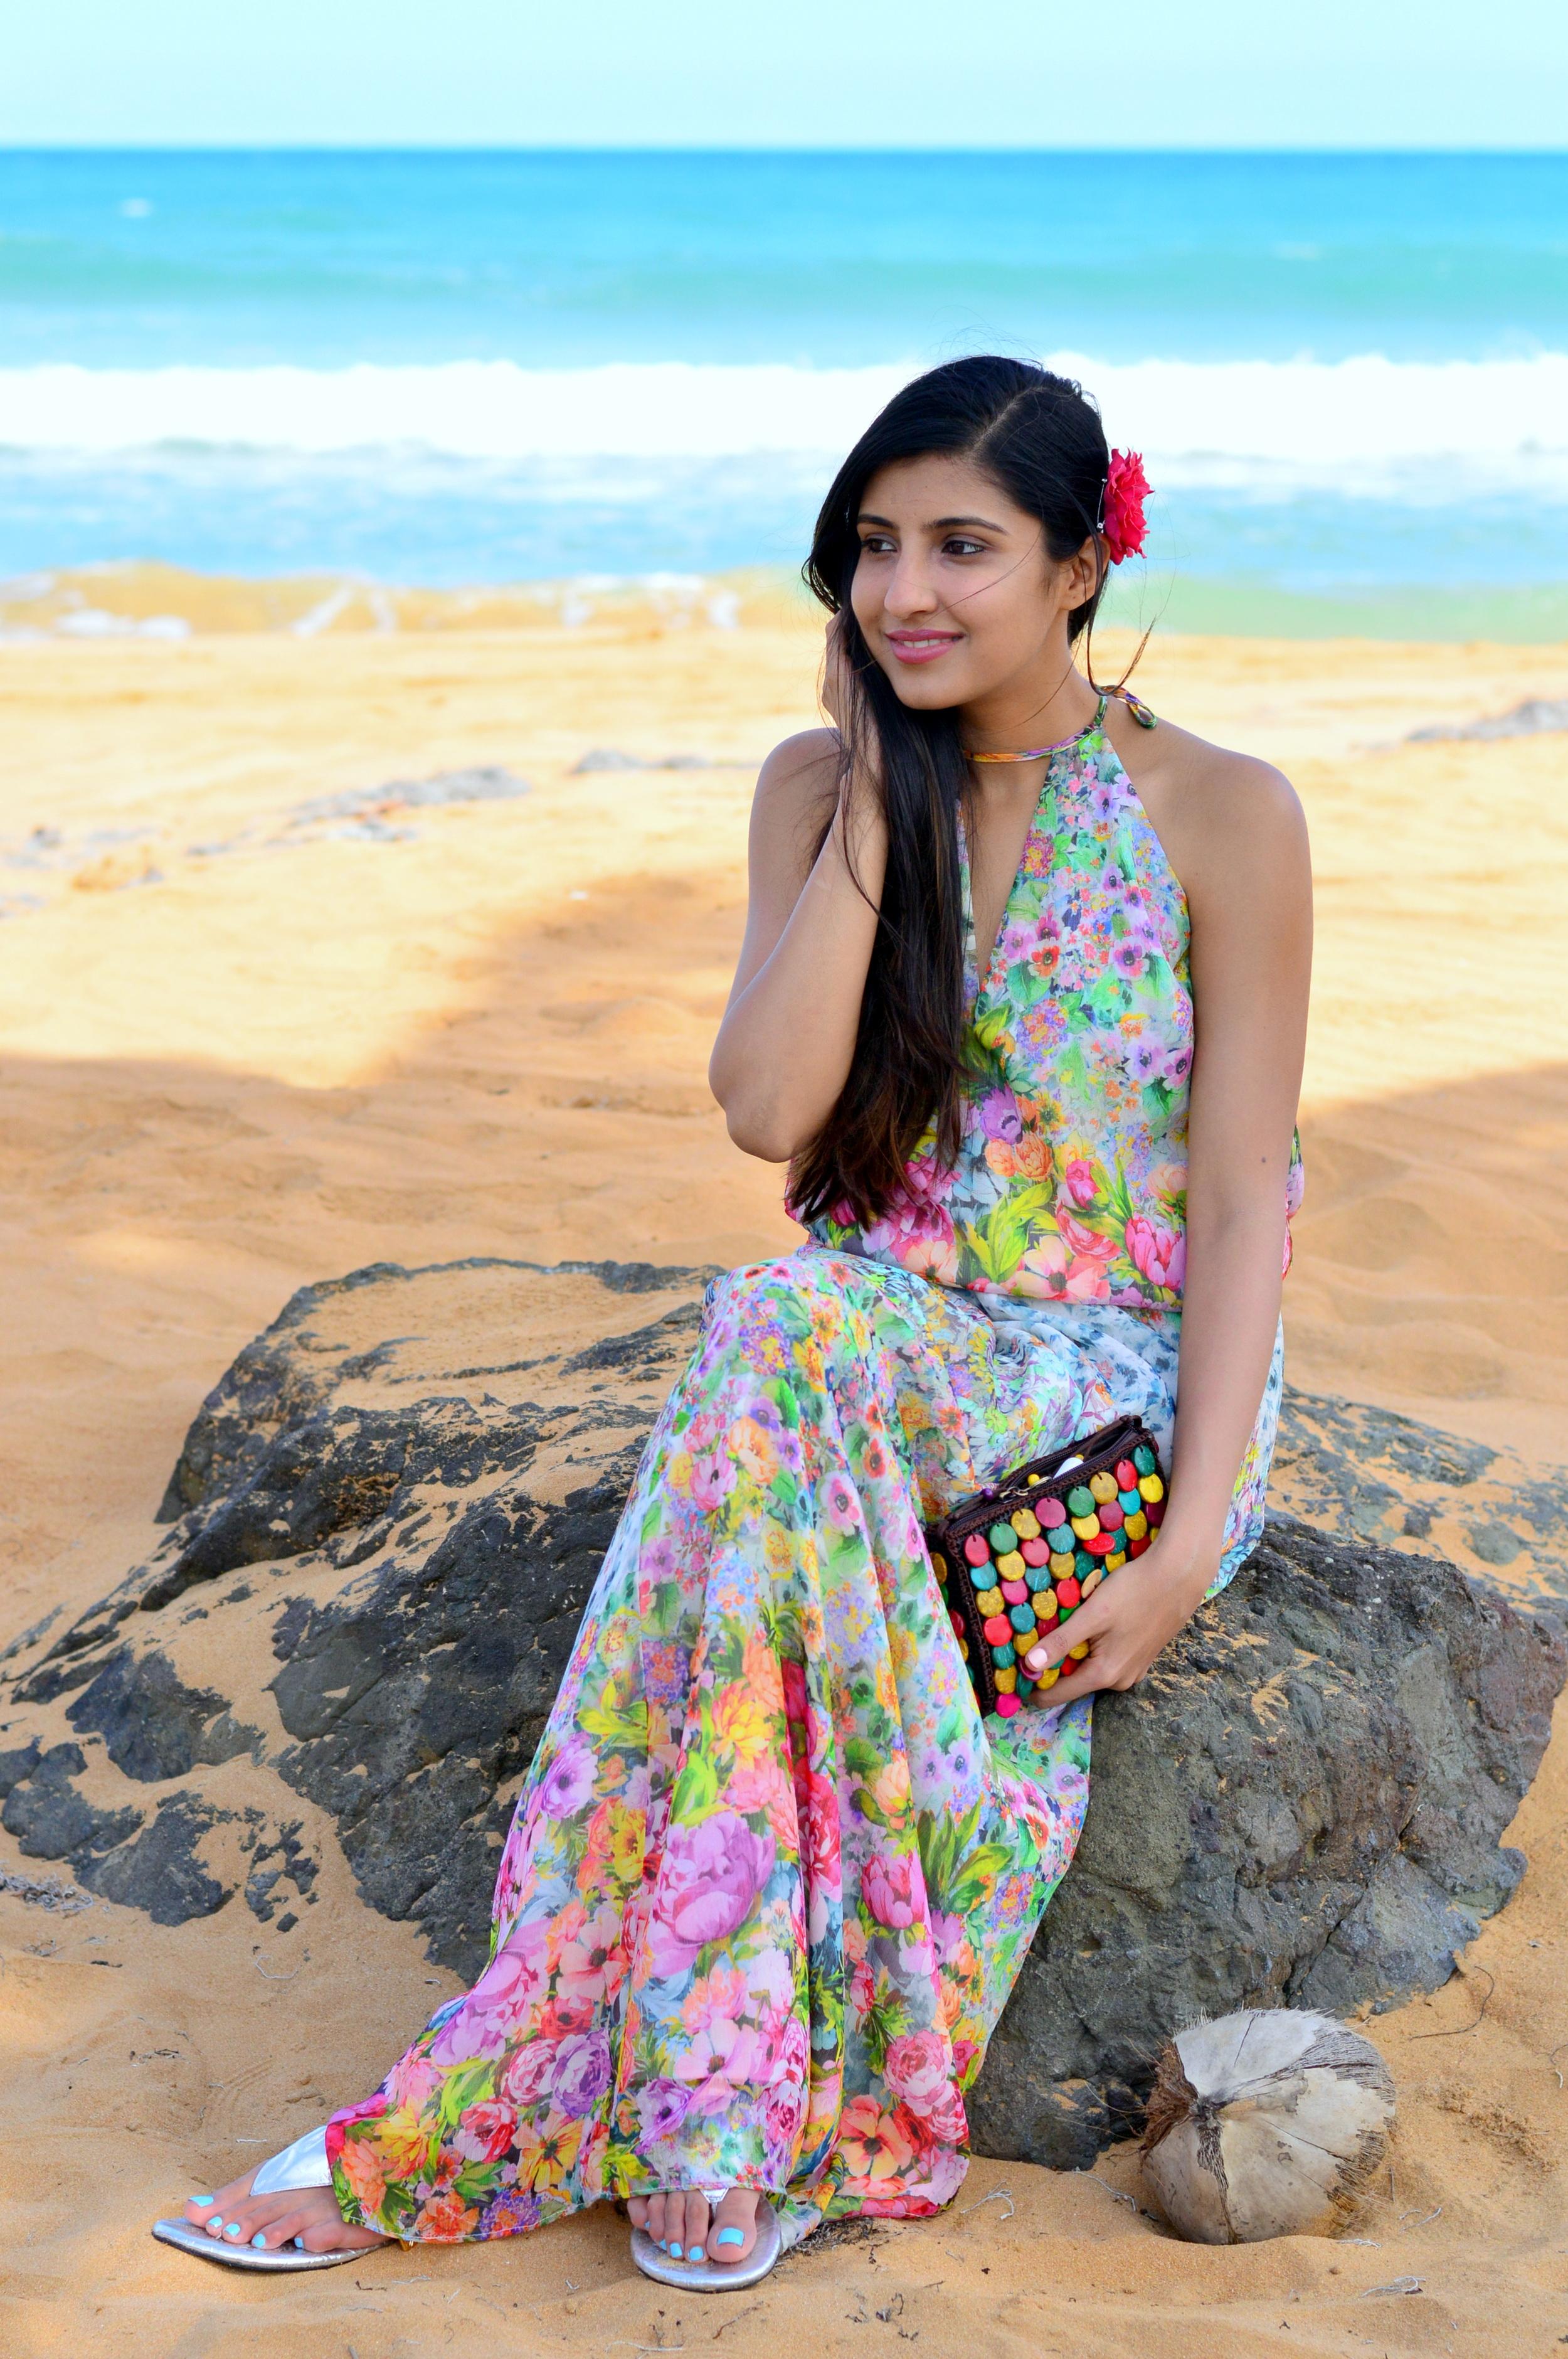 floral-maxi-dress-beach-outfit